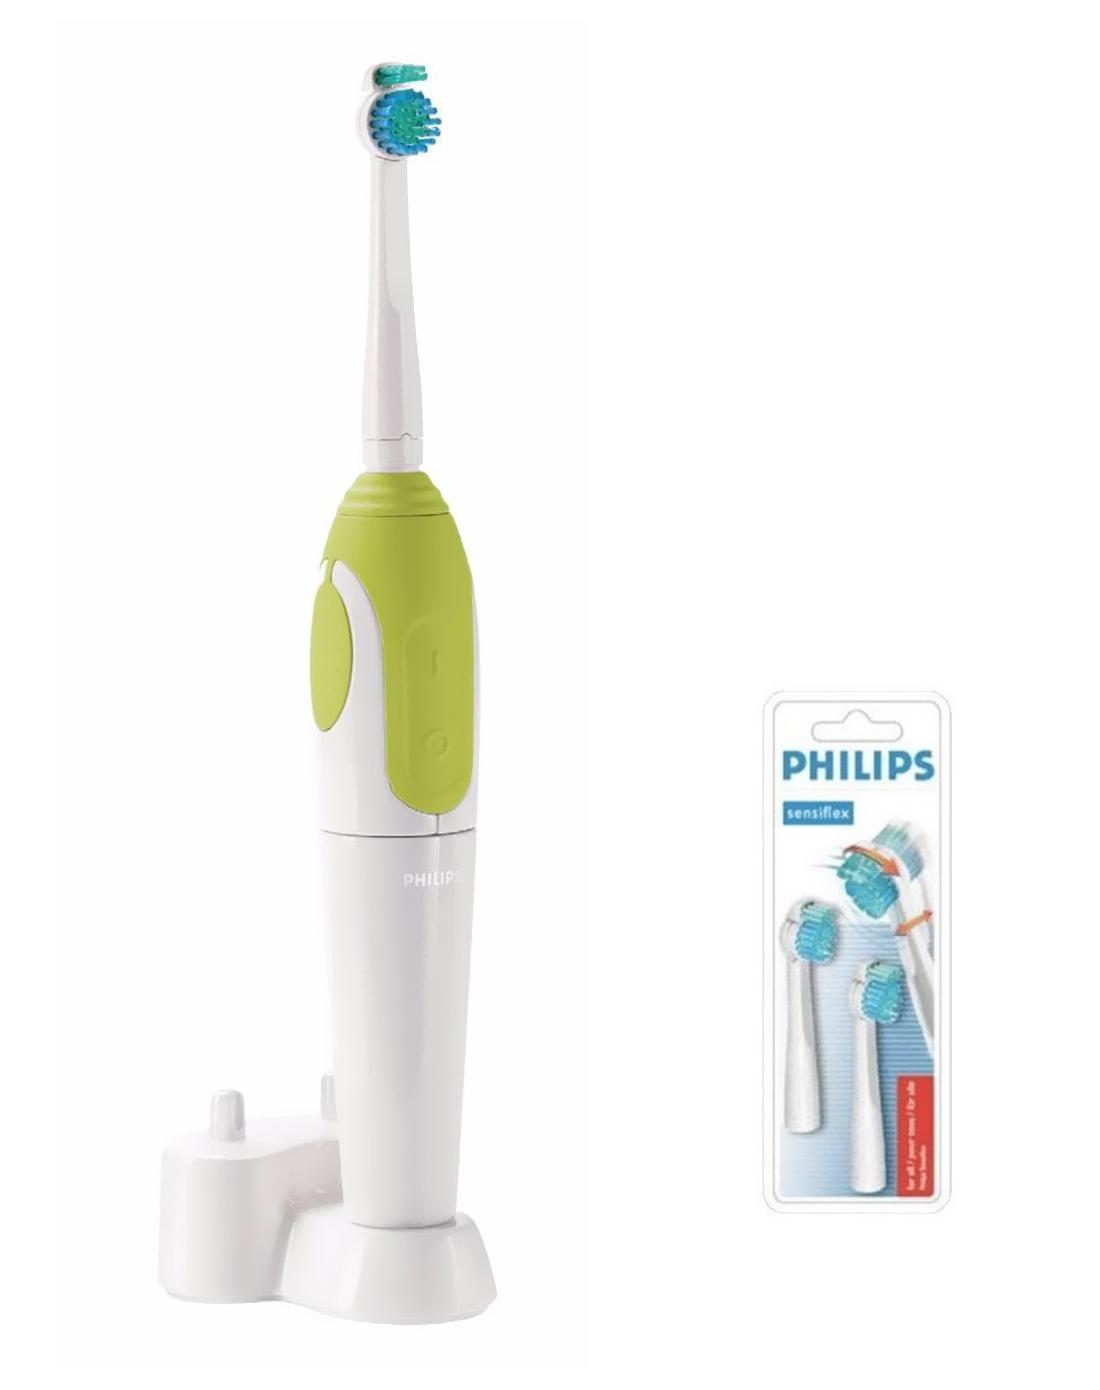 sonicare sensiflex充电式电动牙刷